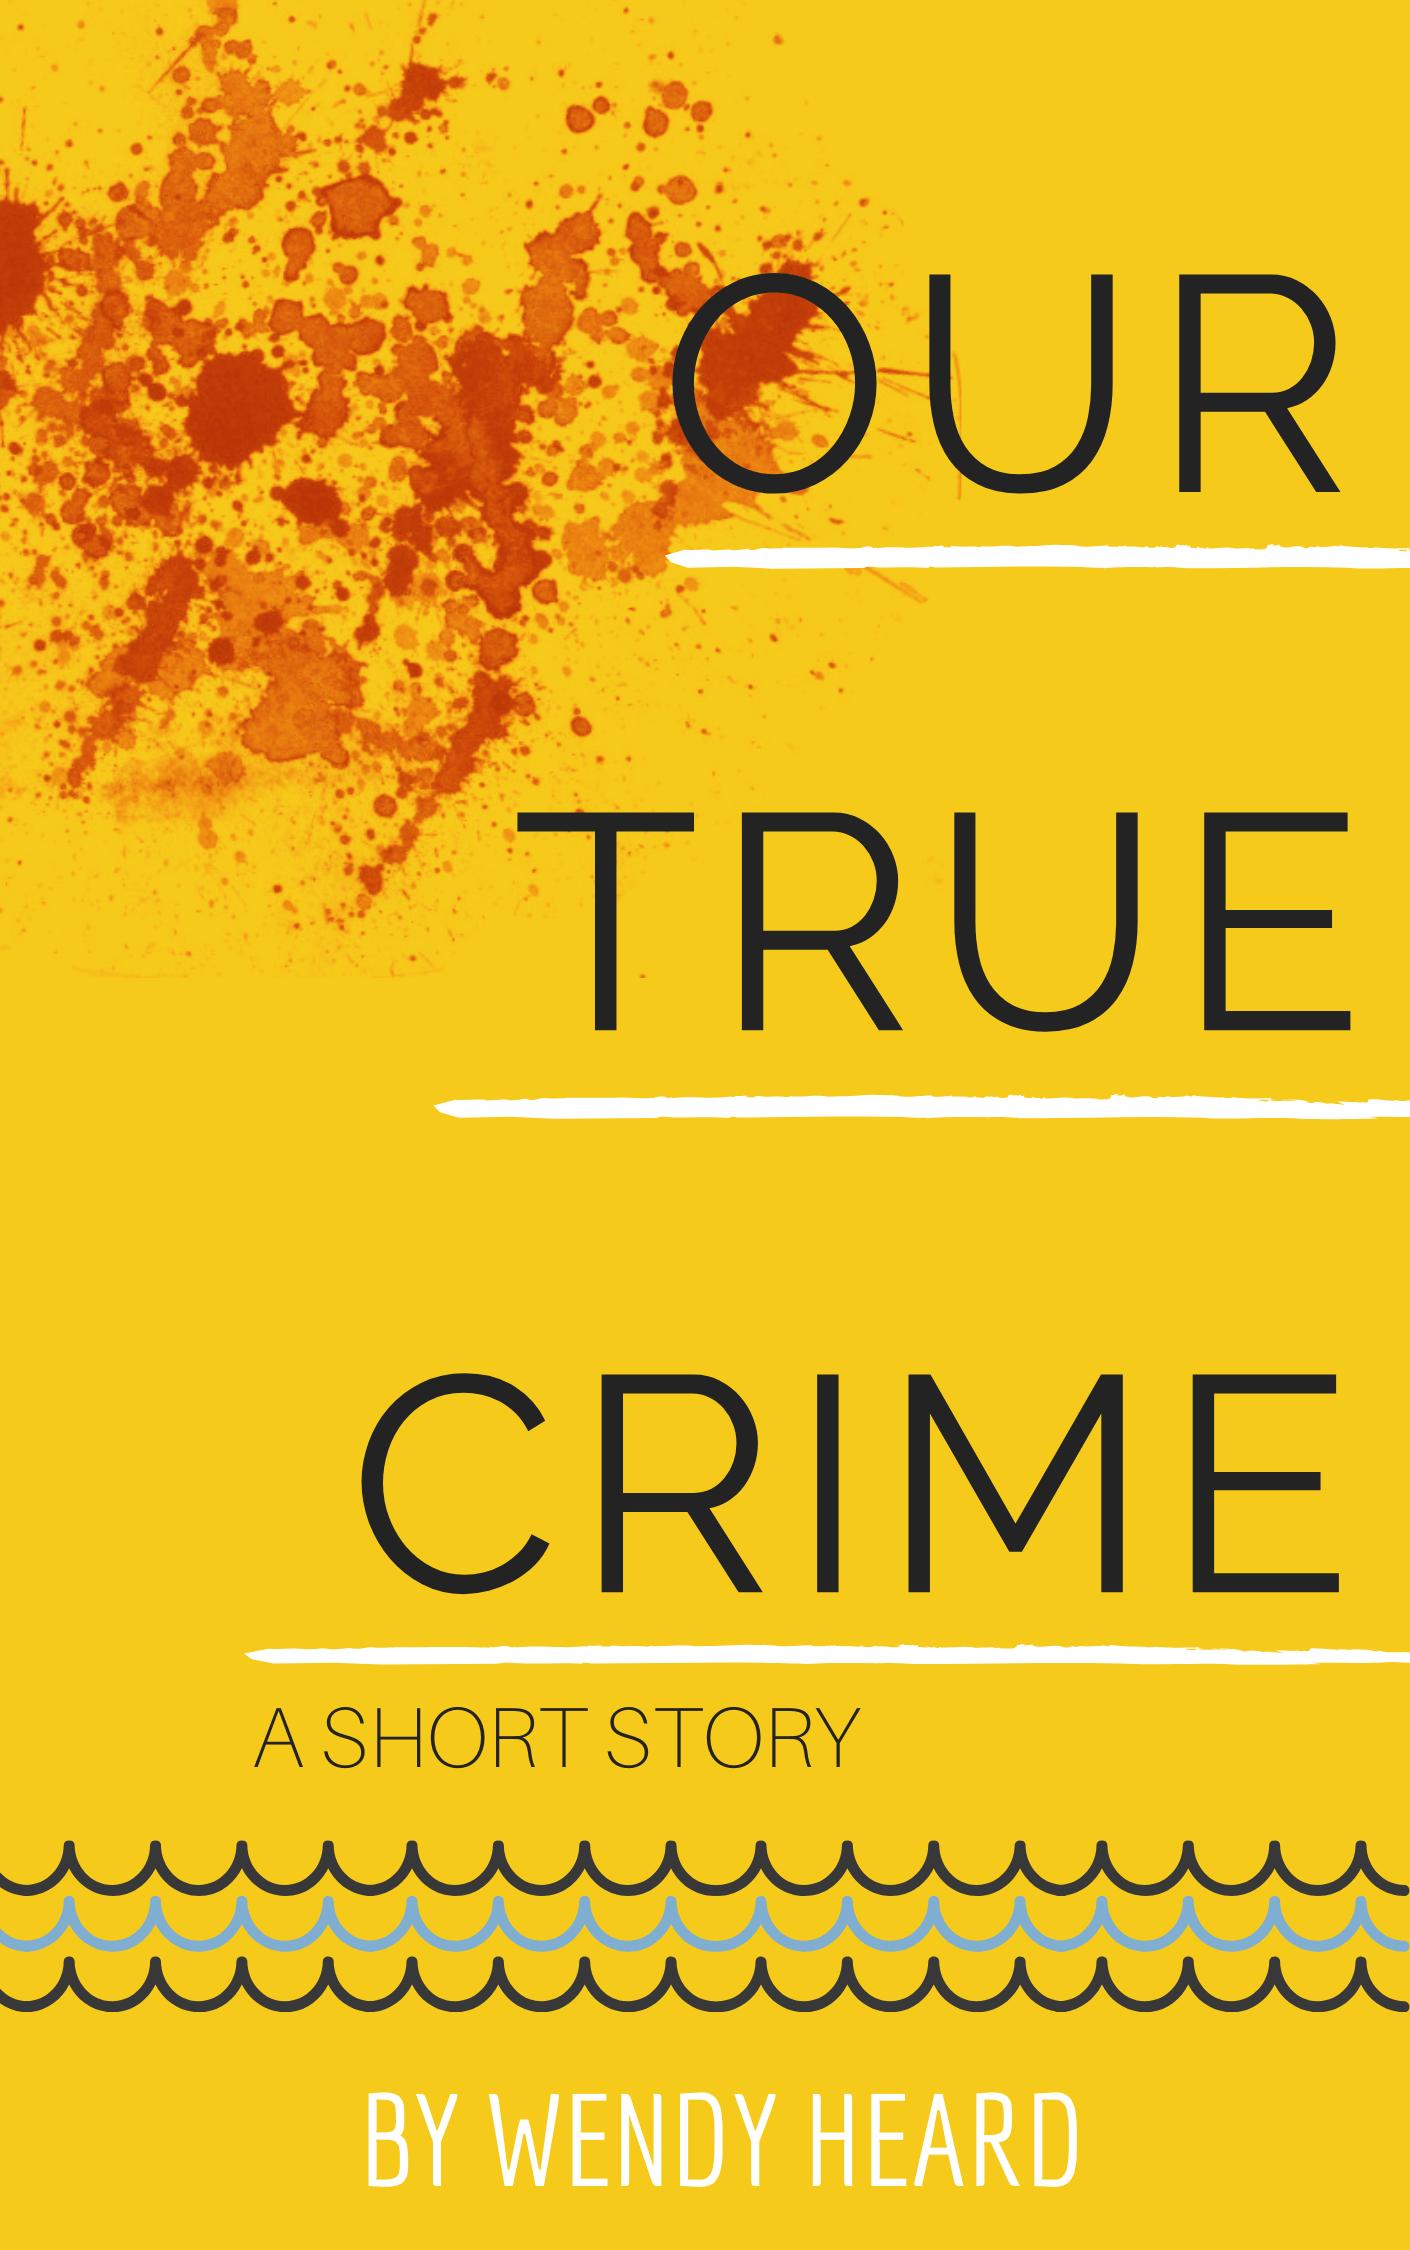 Copy-of-OUR-TRUE-CRIME